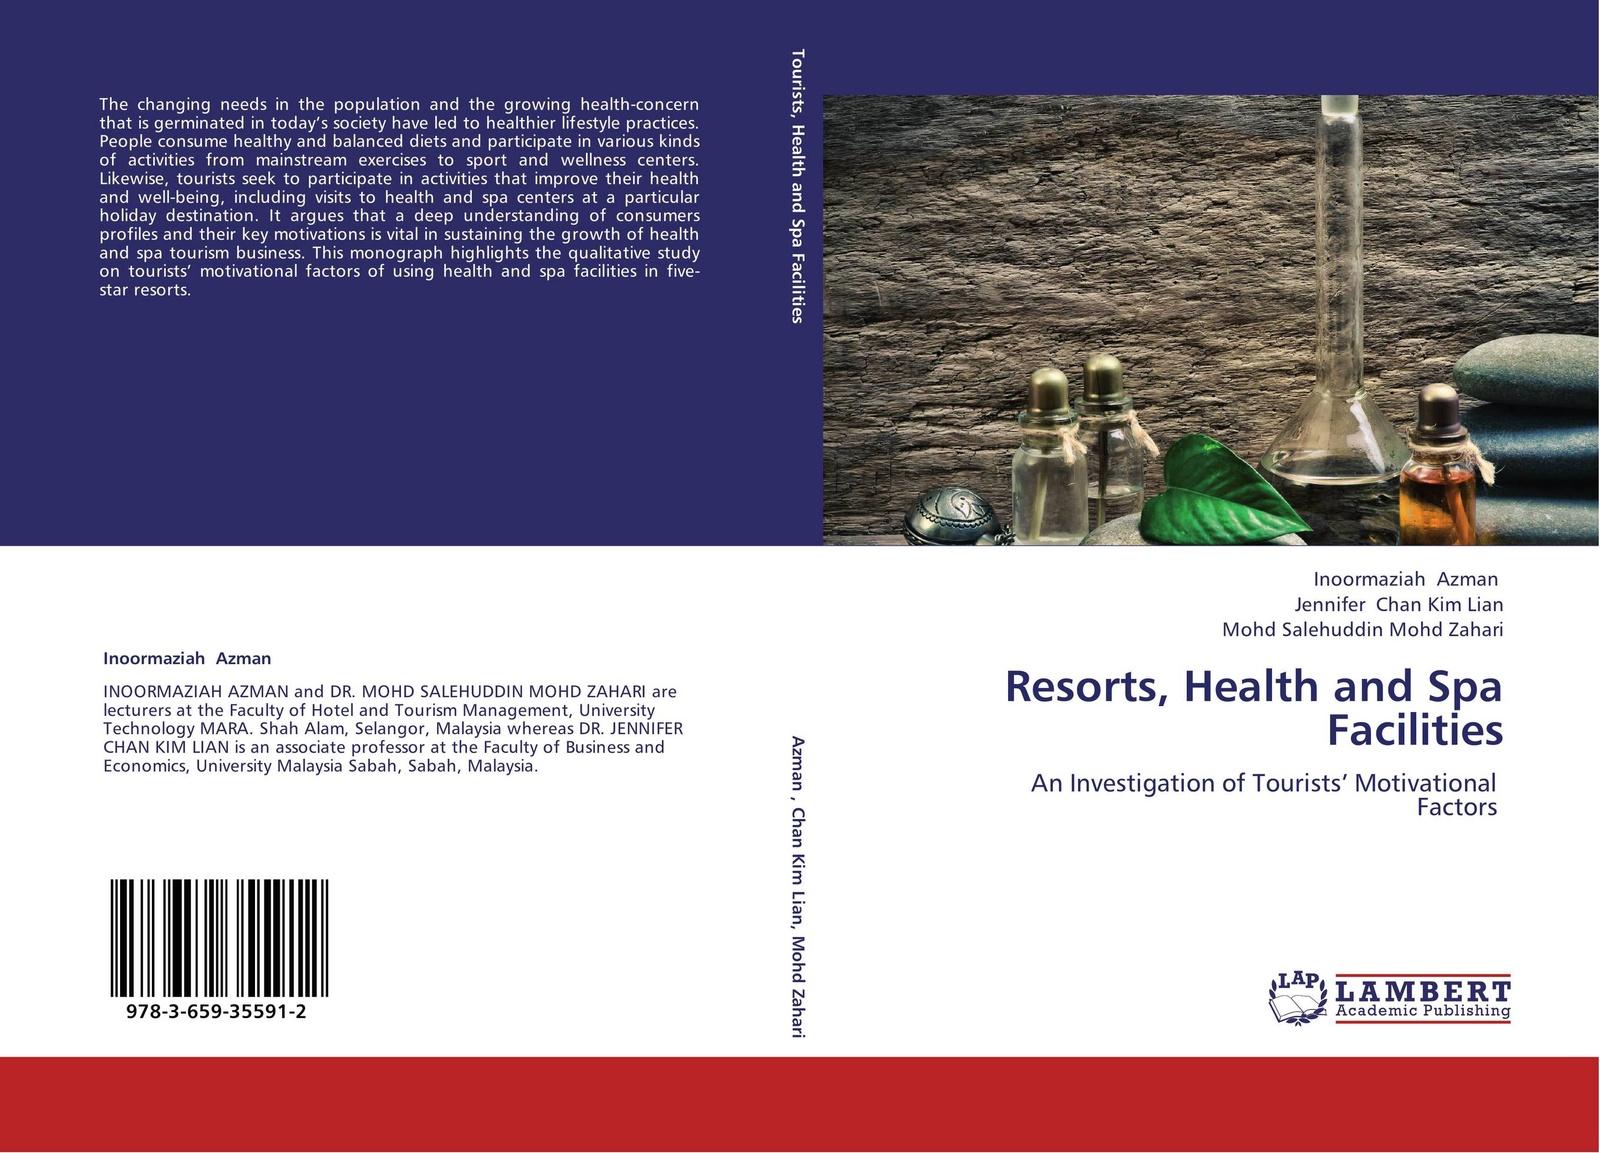 Inoormaziah Azman,Jennifer Chan Kim Lian and Mohd Salehuddin Mohd Zahari Resorts, Health and Spa Facilities myron grant a design that cares planning health facilities for patients and visitors